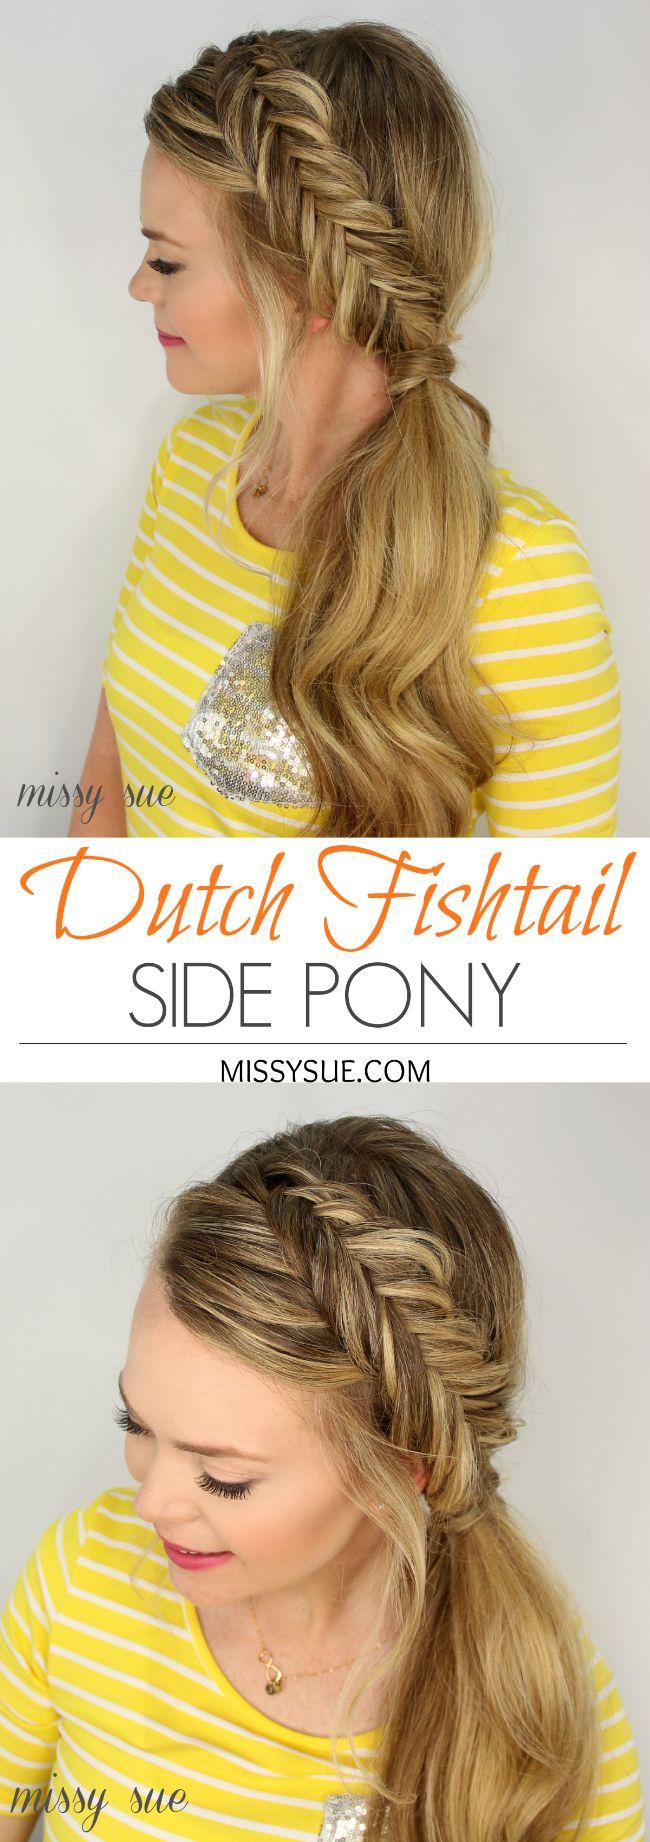 best 25+ dutch fishtail braid ideas on pinterest | fishtail braid